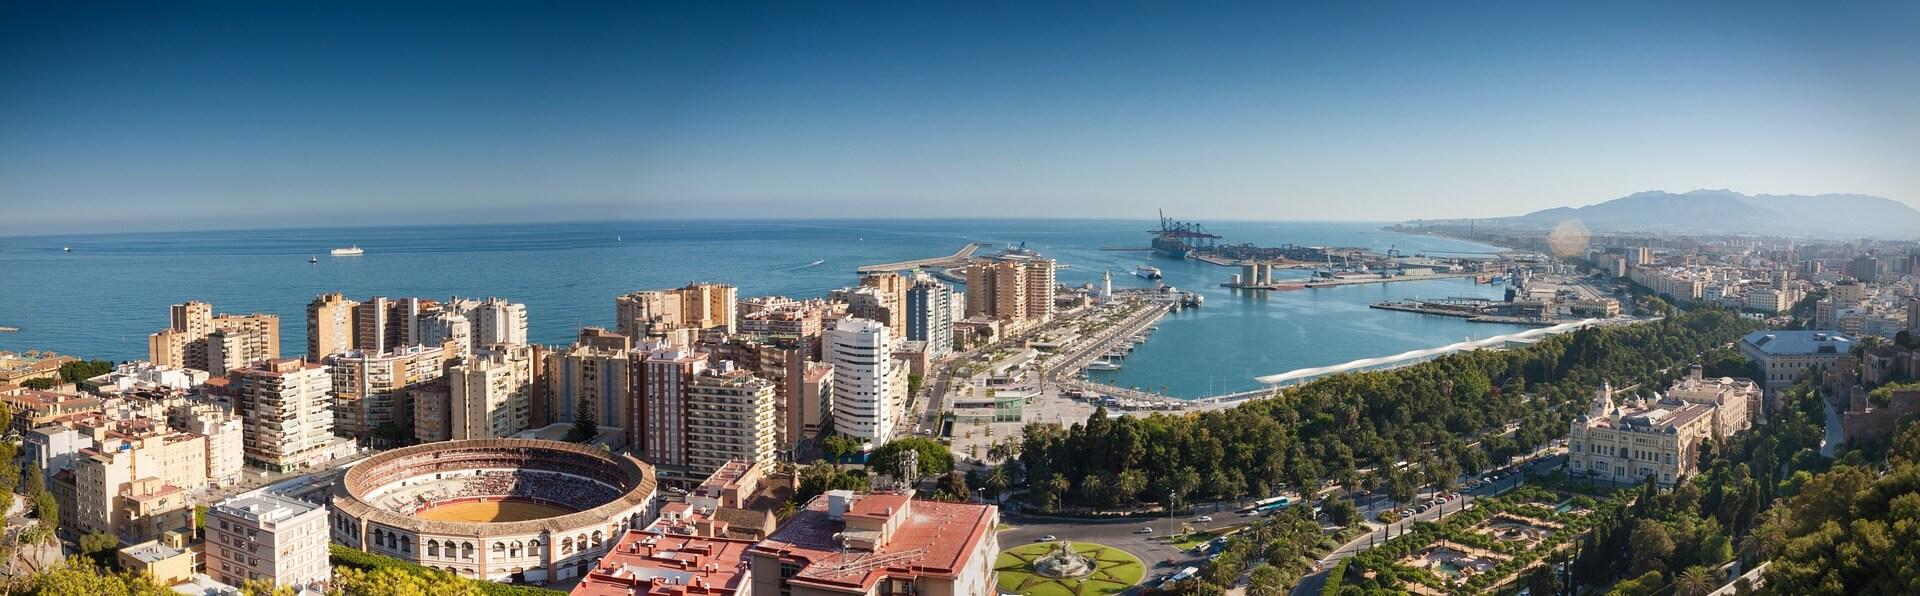 Direktflüge und Billigflüge ab Berlin-Tegel nach Málaga